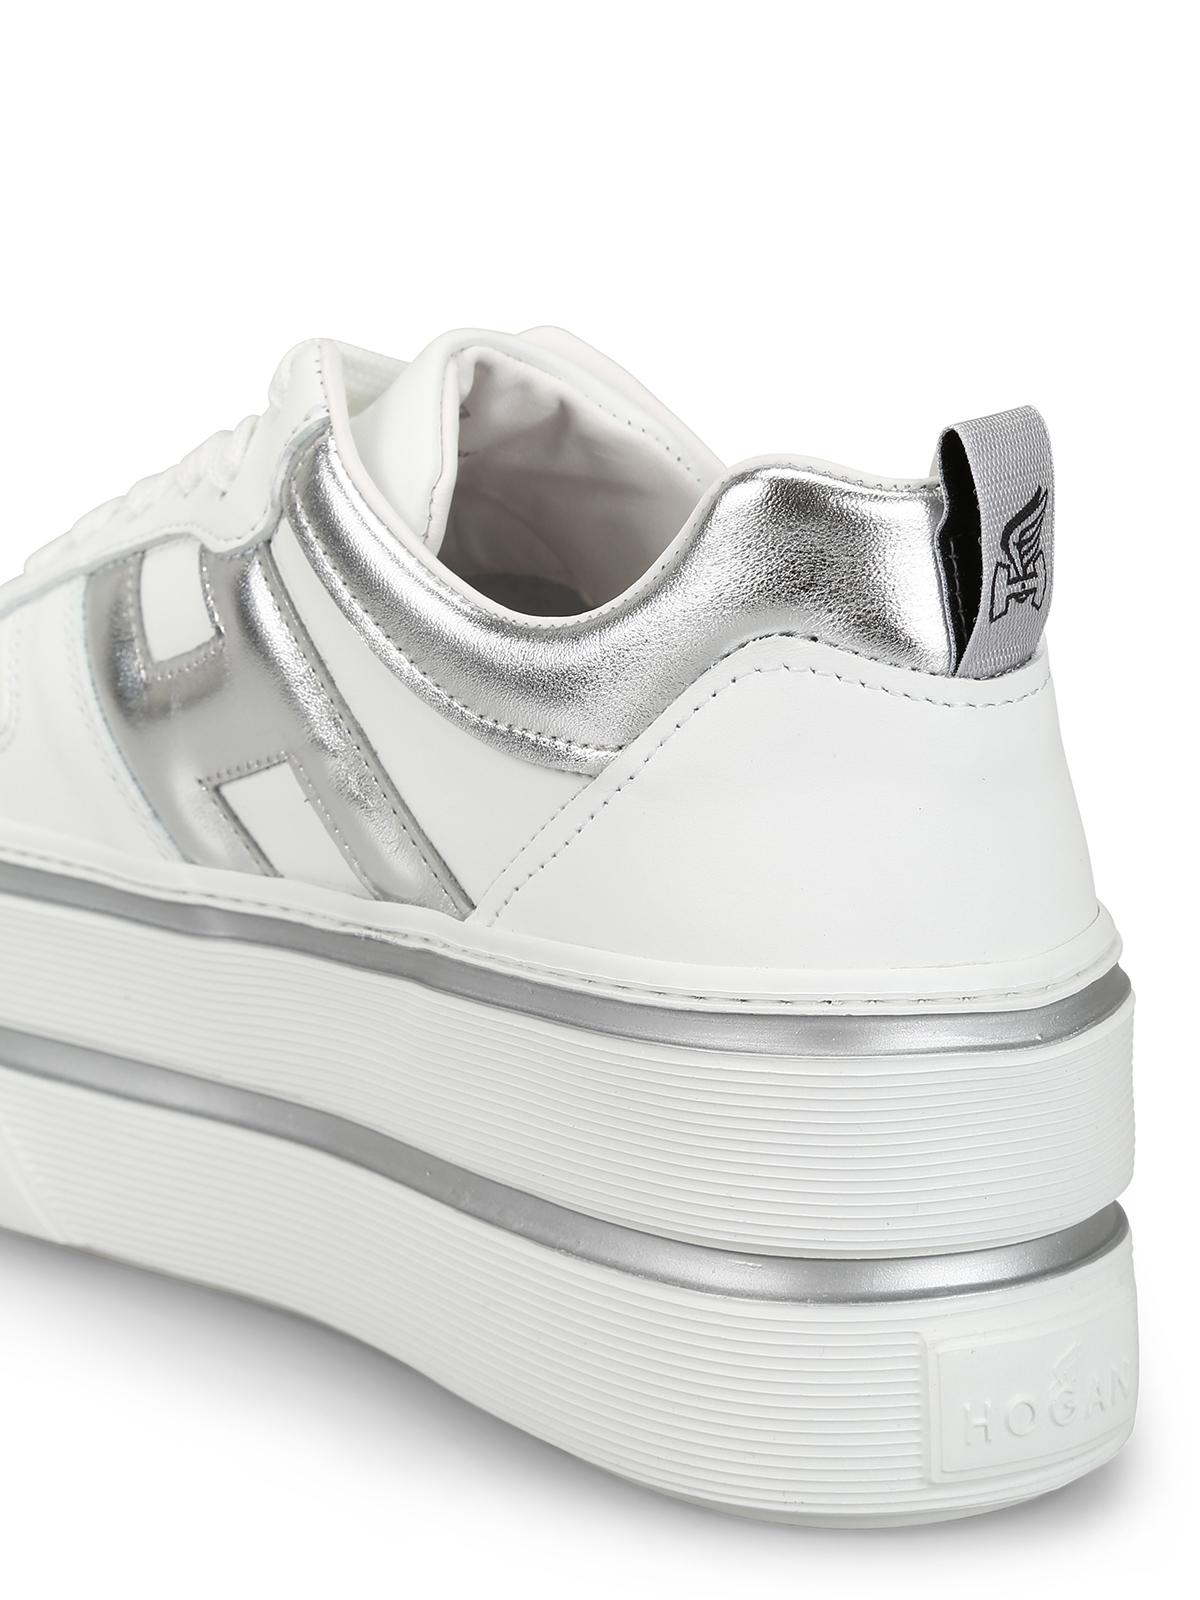 Sneakers Hogan - Sneaker H449 in pelle bianca oversize ...